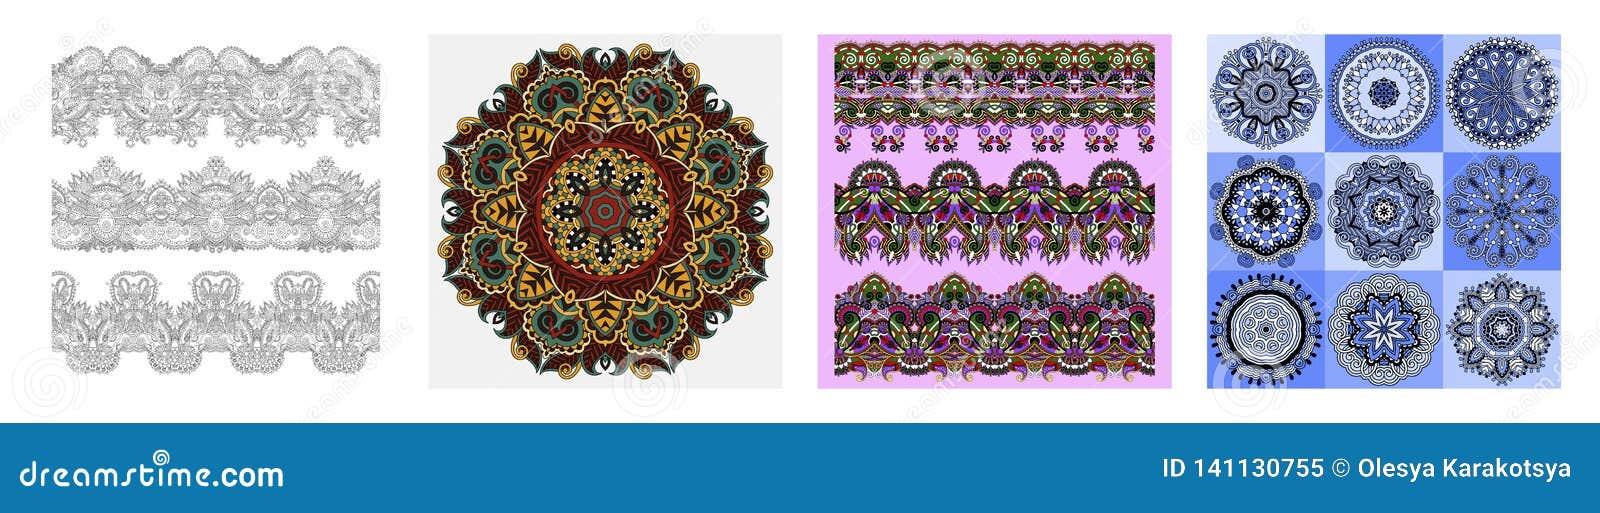 Sömlösa dekorativa blom- band i indisk kalamkaristil